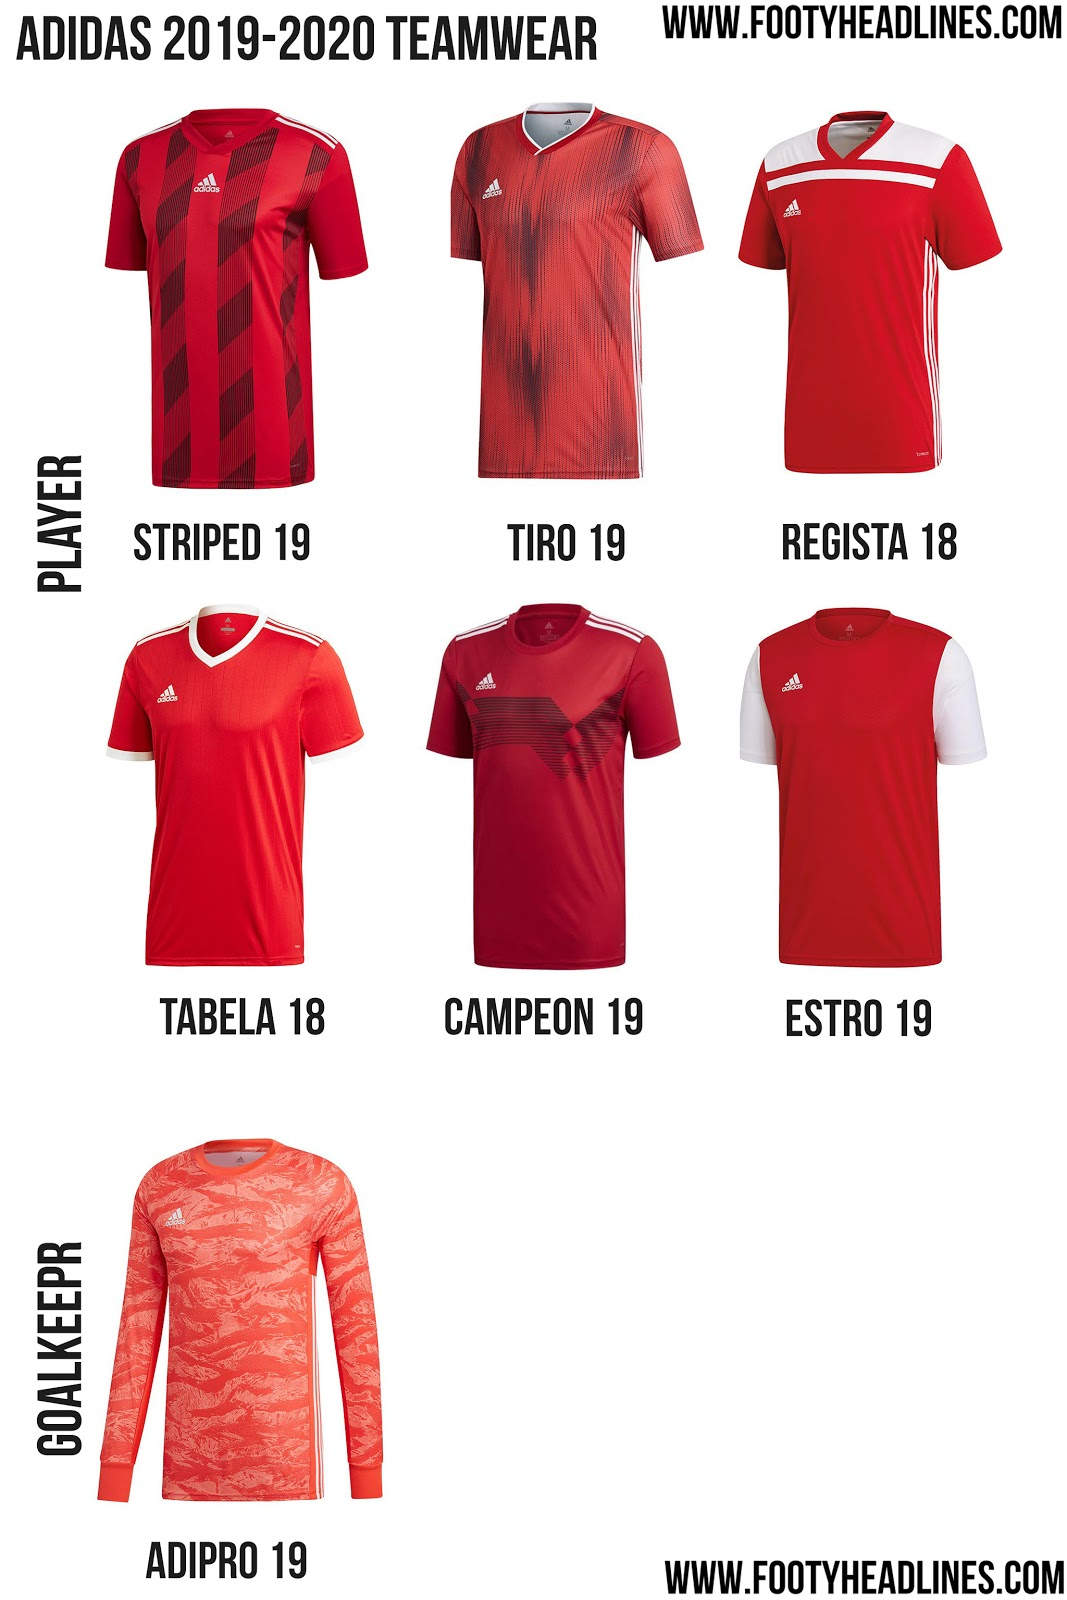 cf9e25c96 All Adidas, Nike & Puma 19-20 Teamwear Kits Released - Overview ...